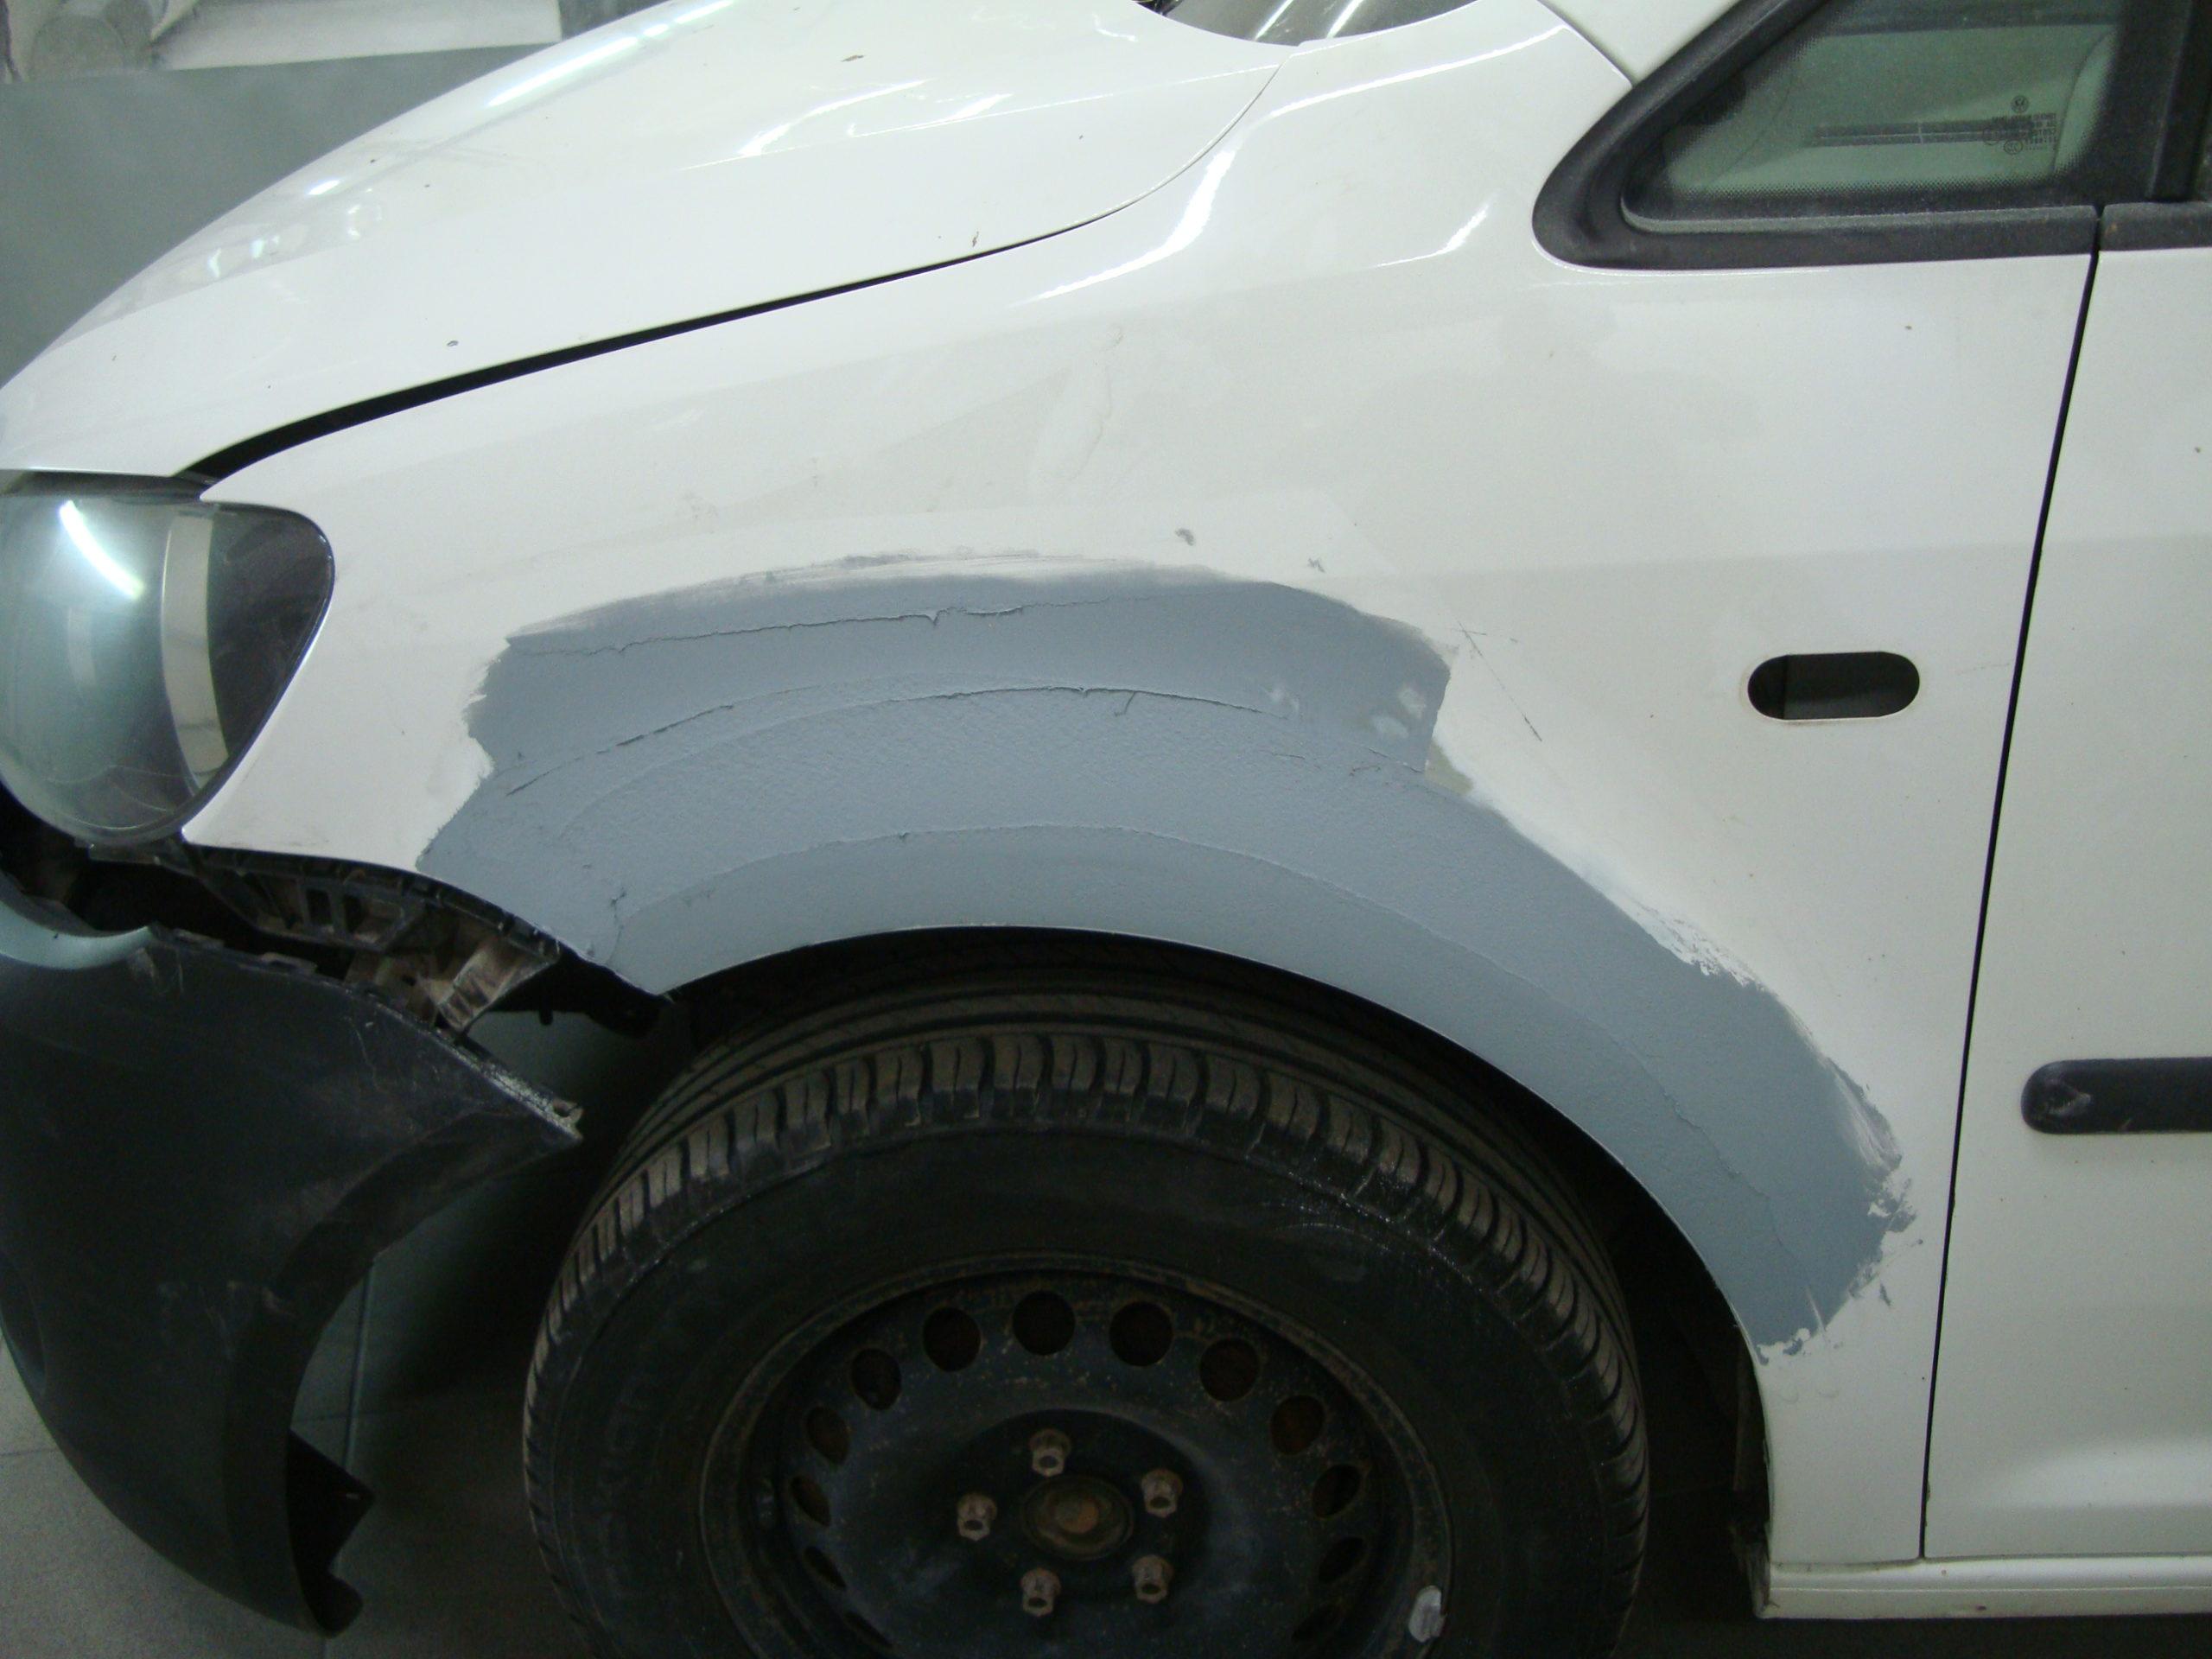 Фольксваген (Volkswagen) крыло зашпаклевали